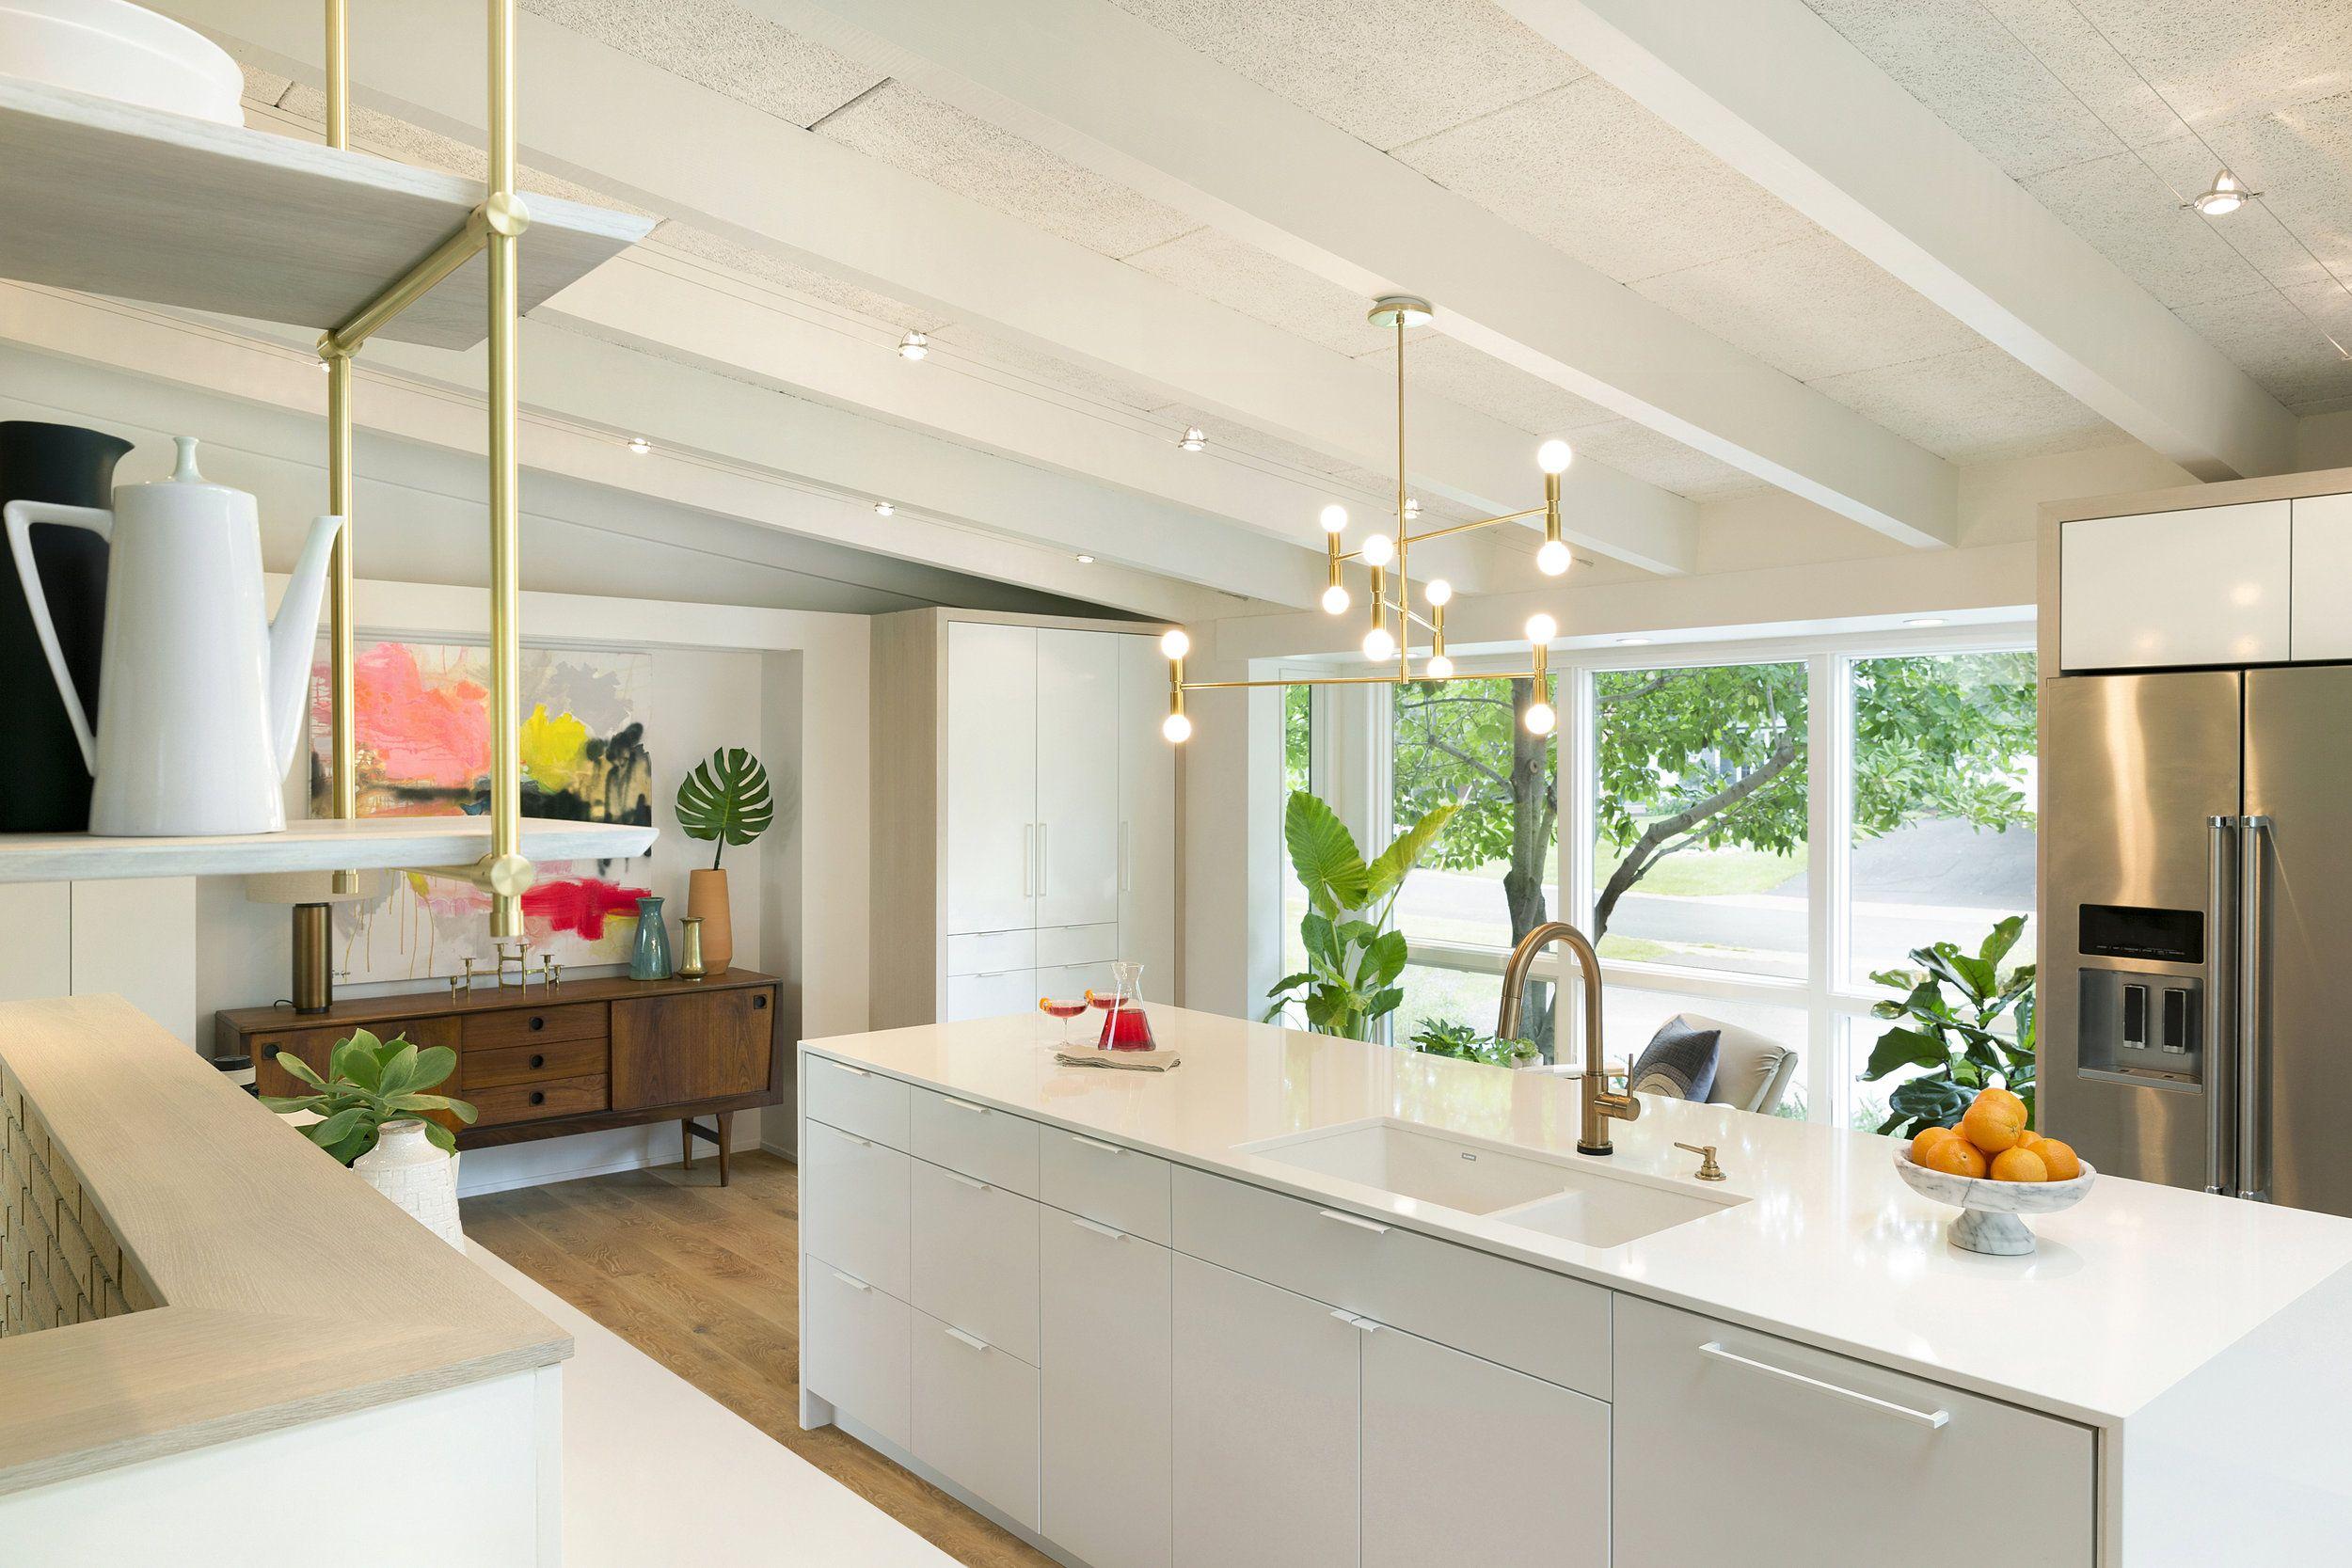 Minneapolis, MN Interior Design Firm / Midcentury Renovation / Lifestyle  Photo Shoot